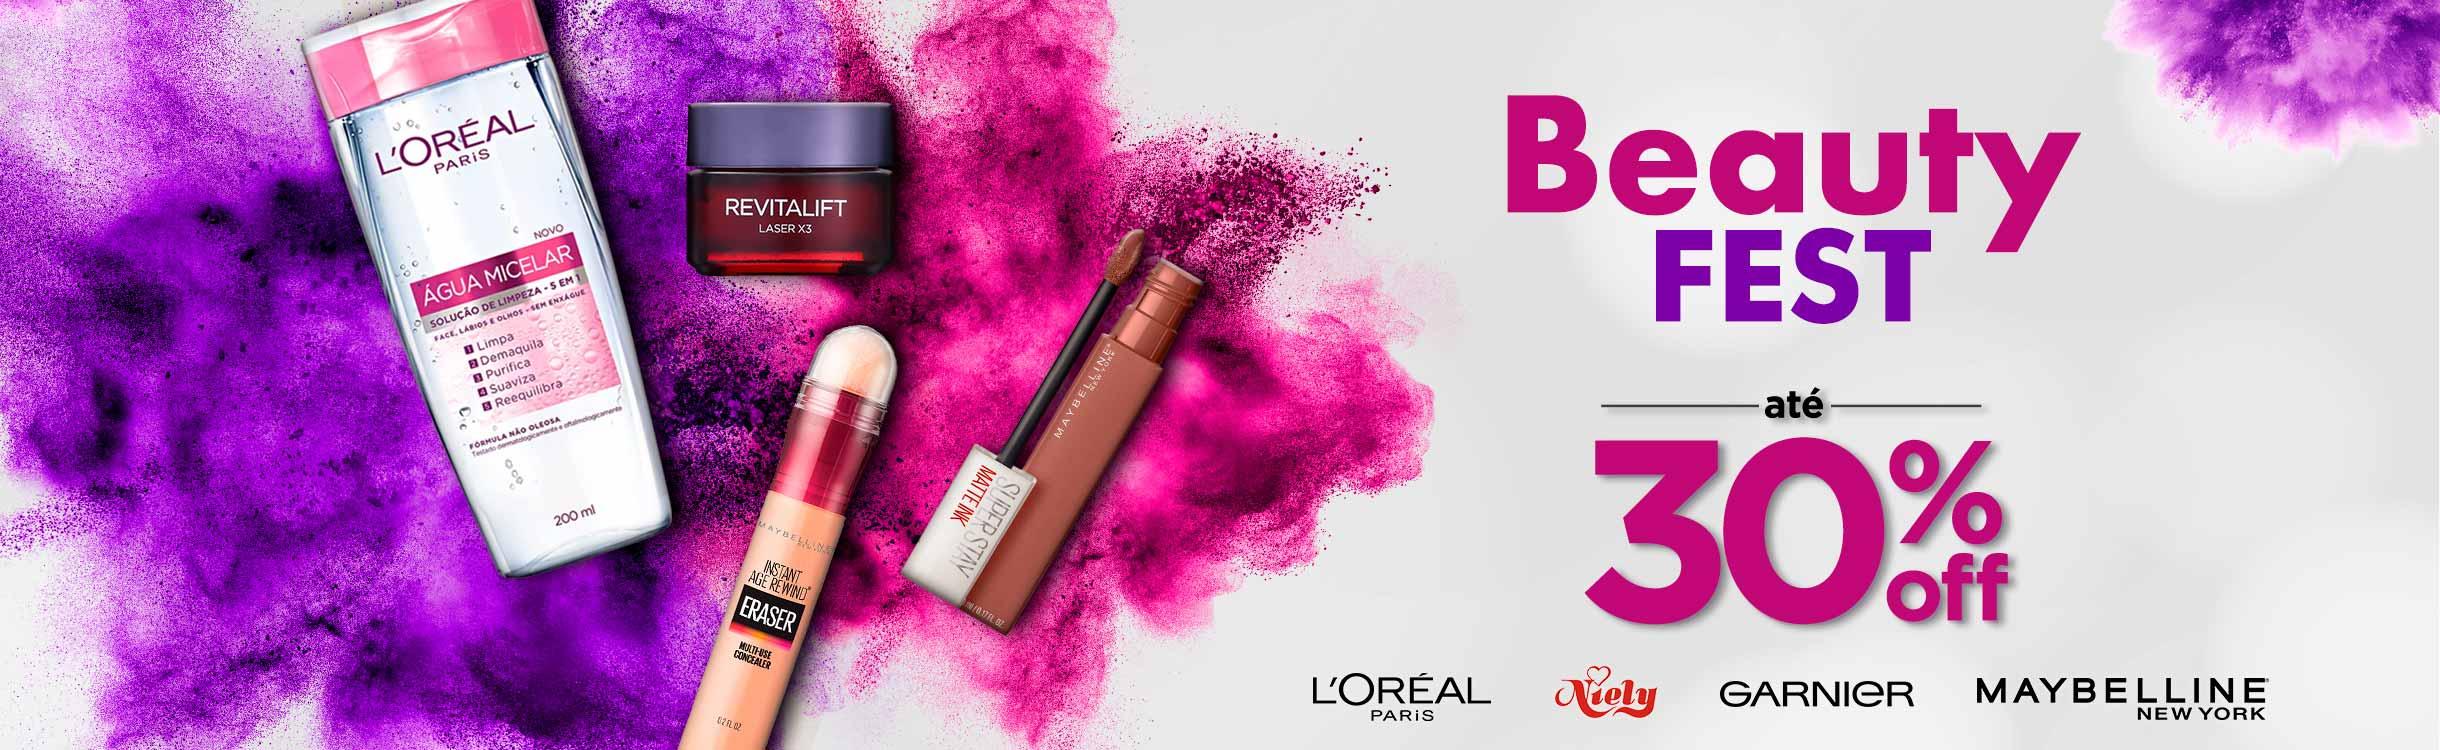 Beauty Fest 30%OFF